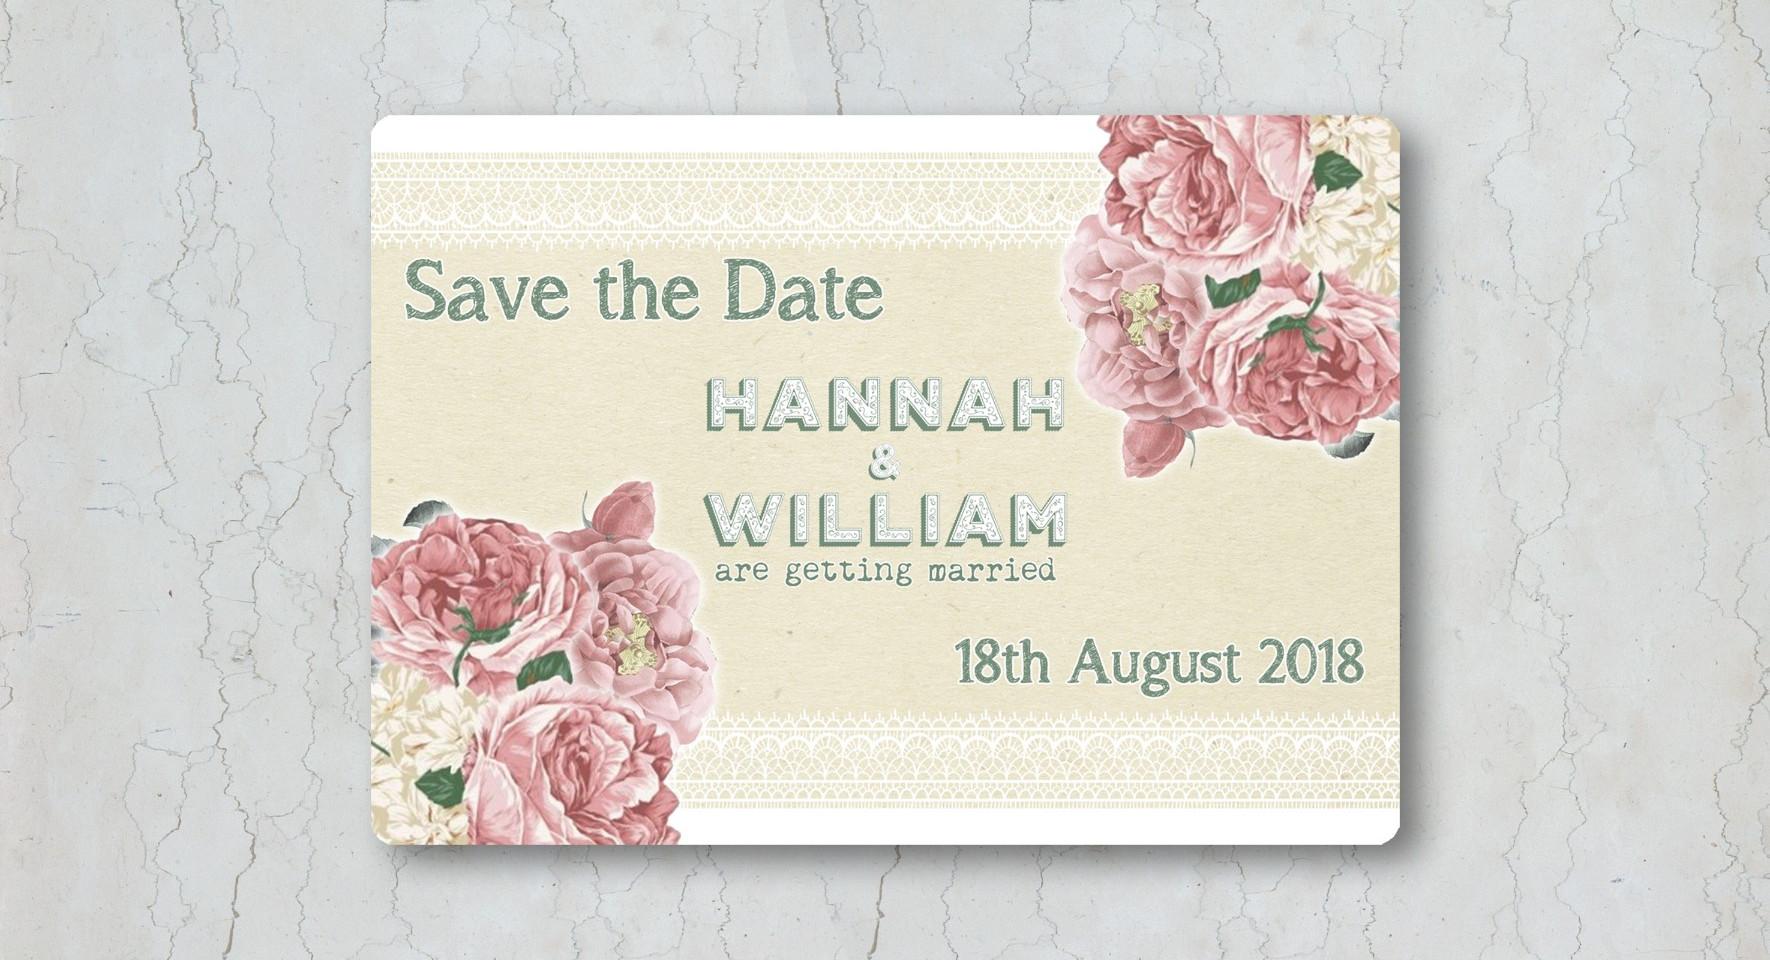 Vintage Rose Save the Date Wedding Invitation